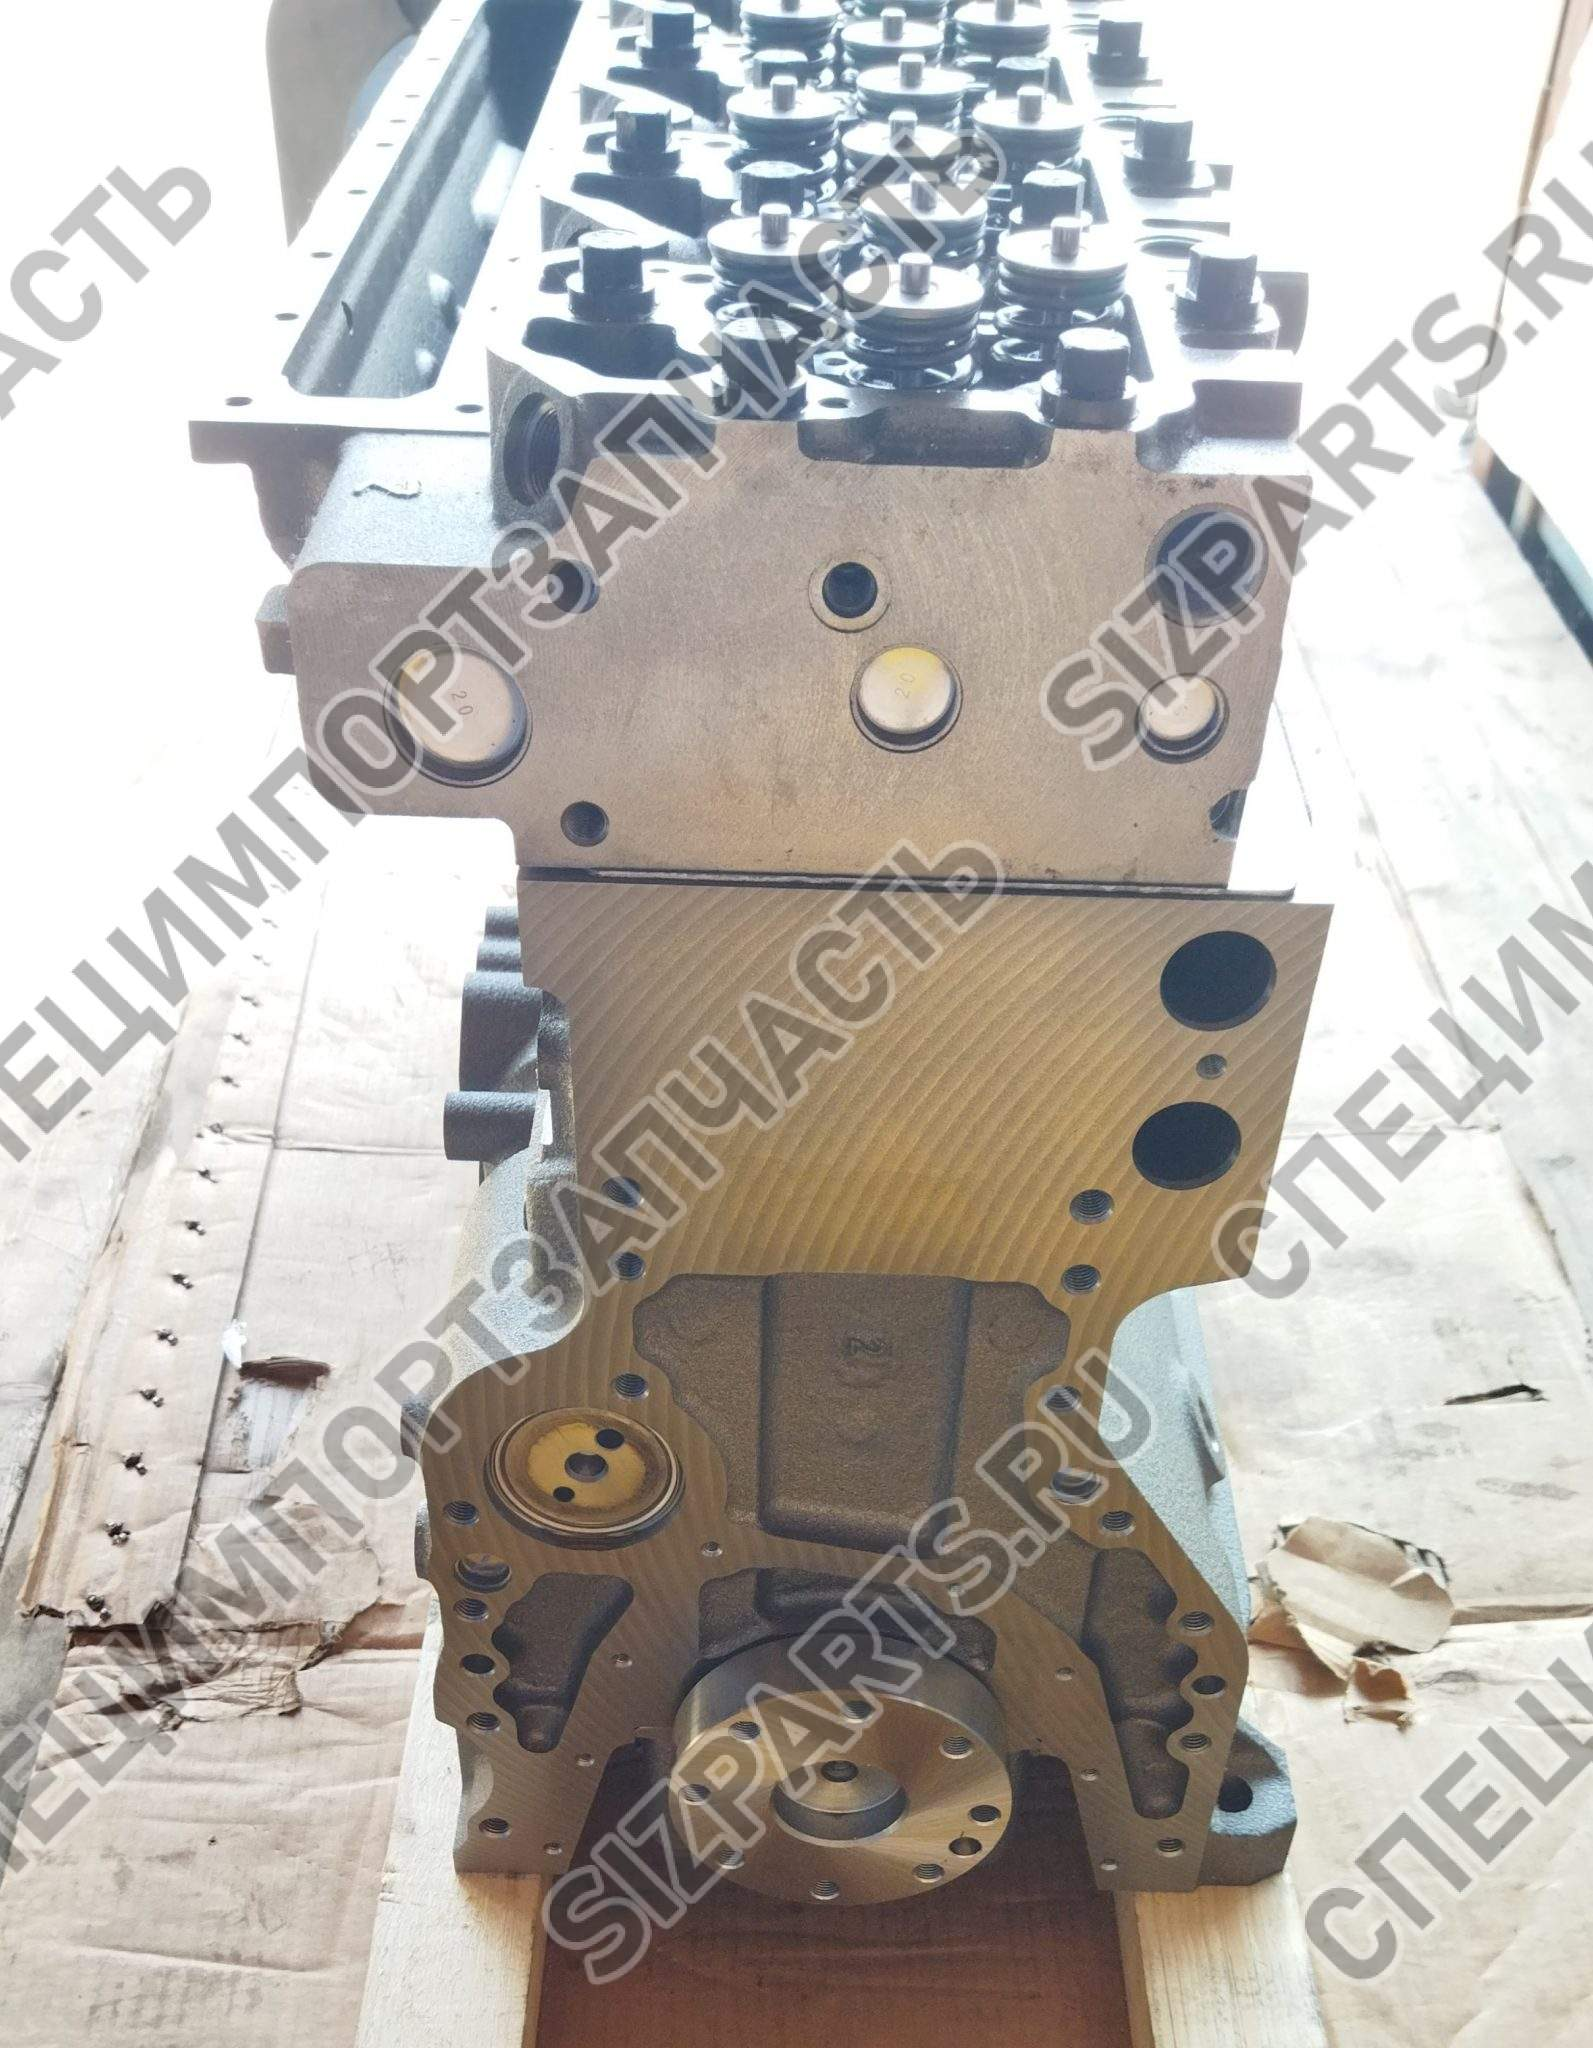 Cборка лонг-блока для экскаватора Komatsu PC300-8 (ЭО-4227) 6